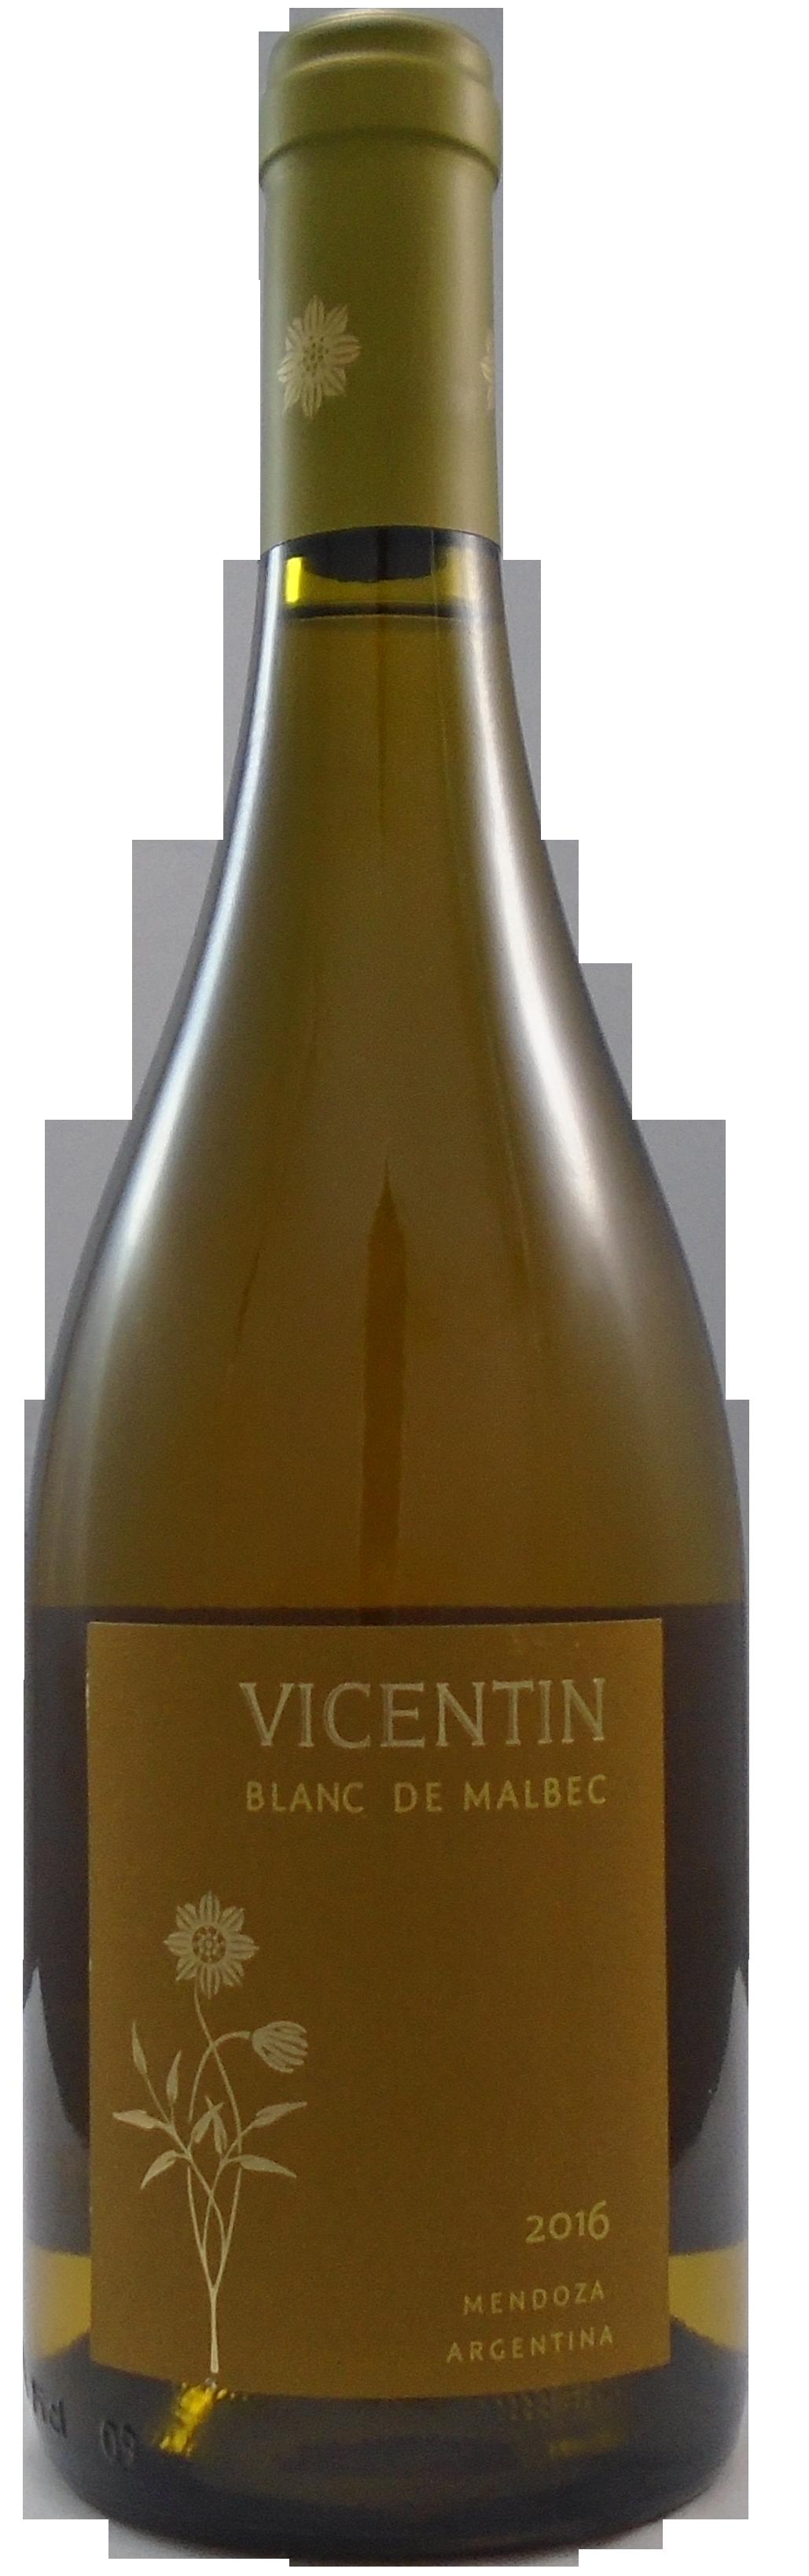 Vicentin Blanc de Malbec 2016